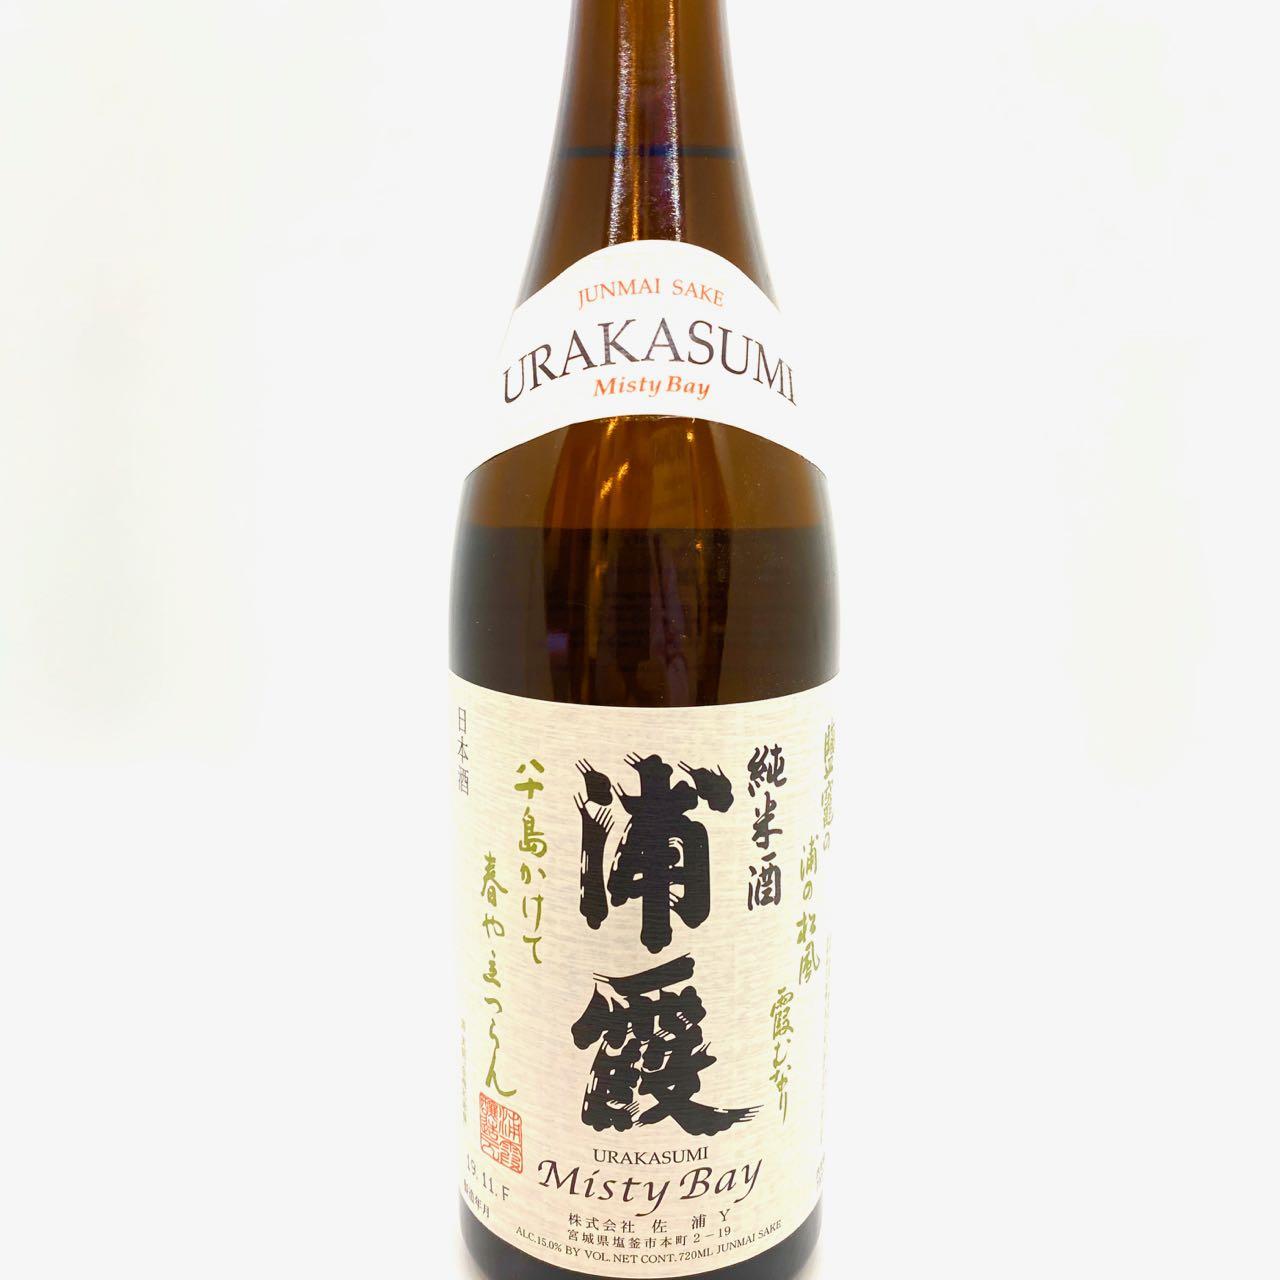 SAKE Urakasumi Misty Bay